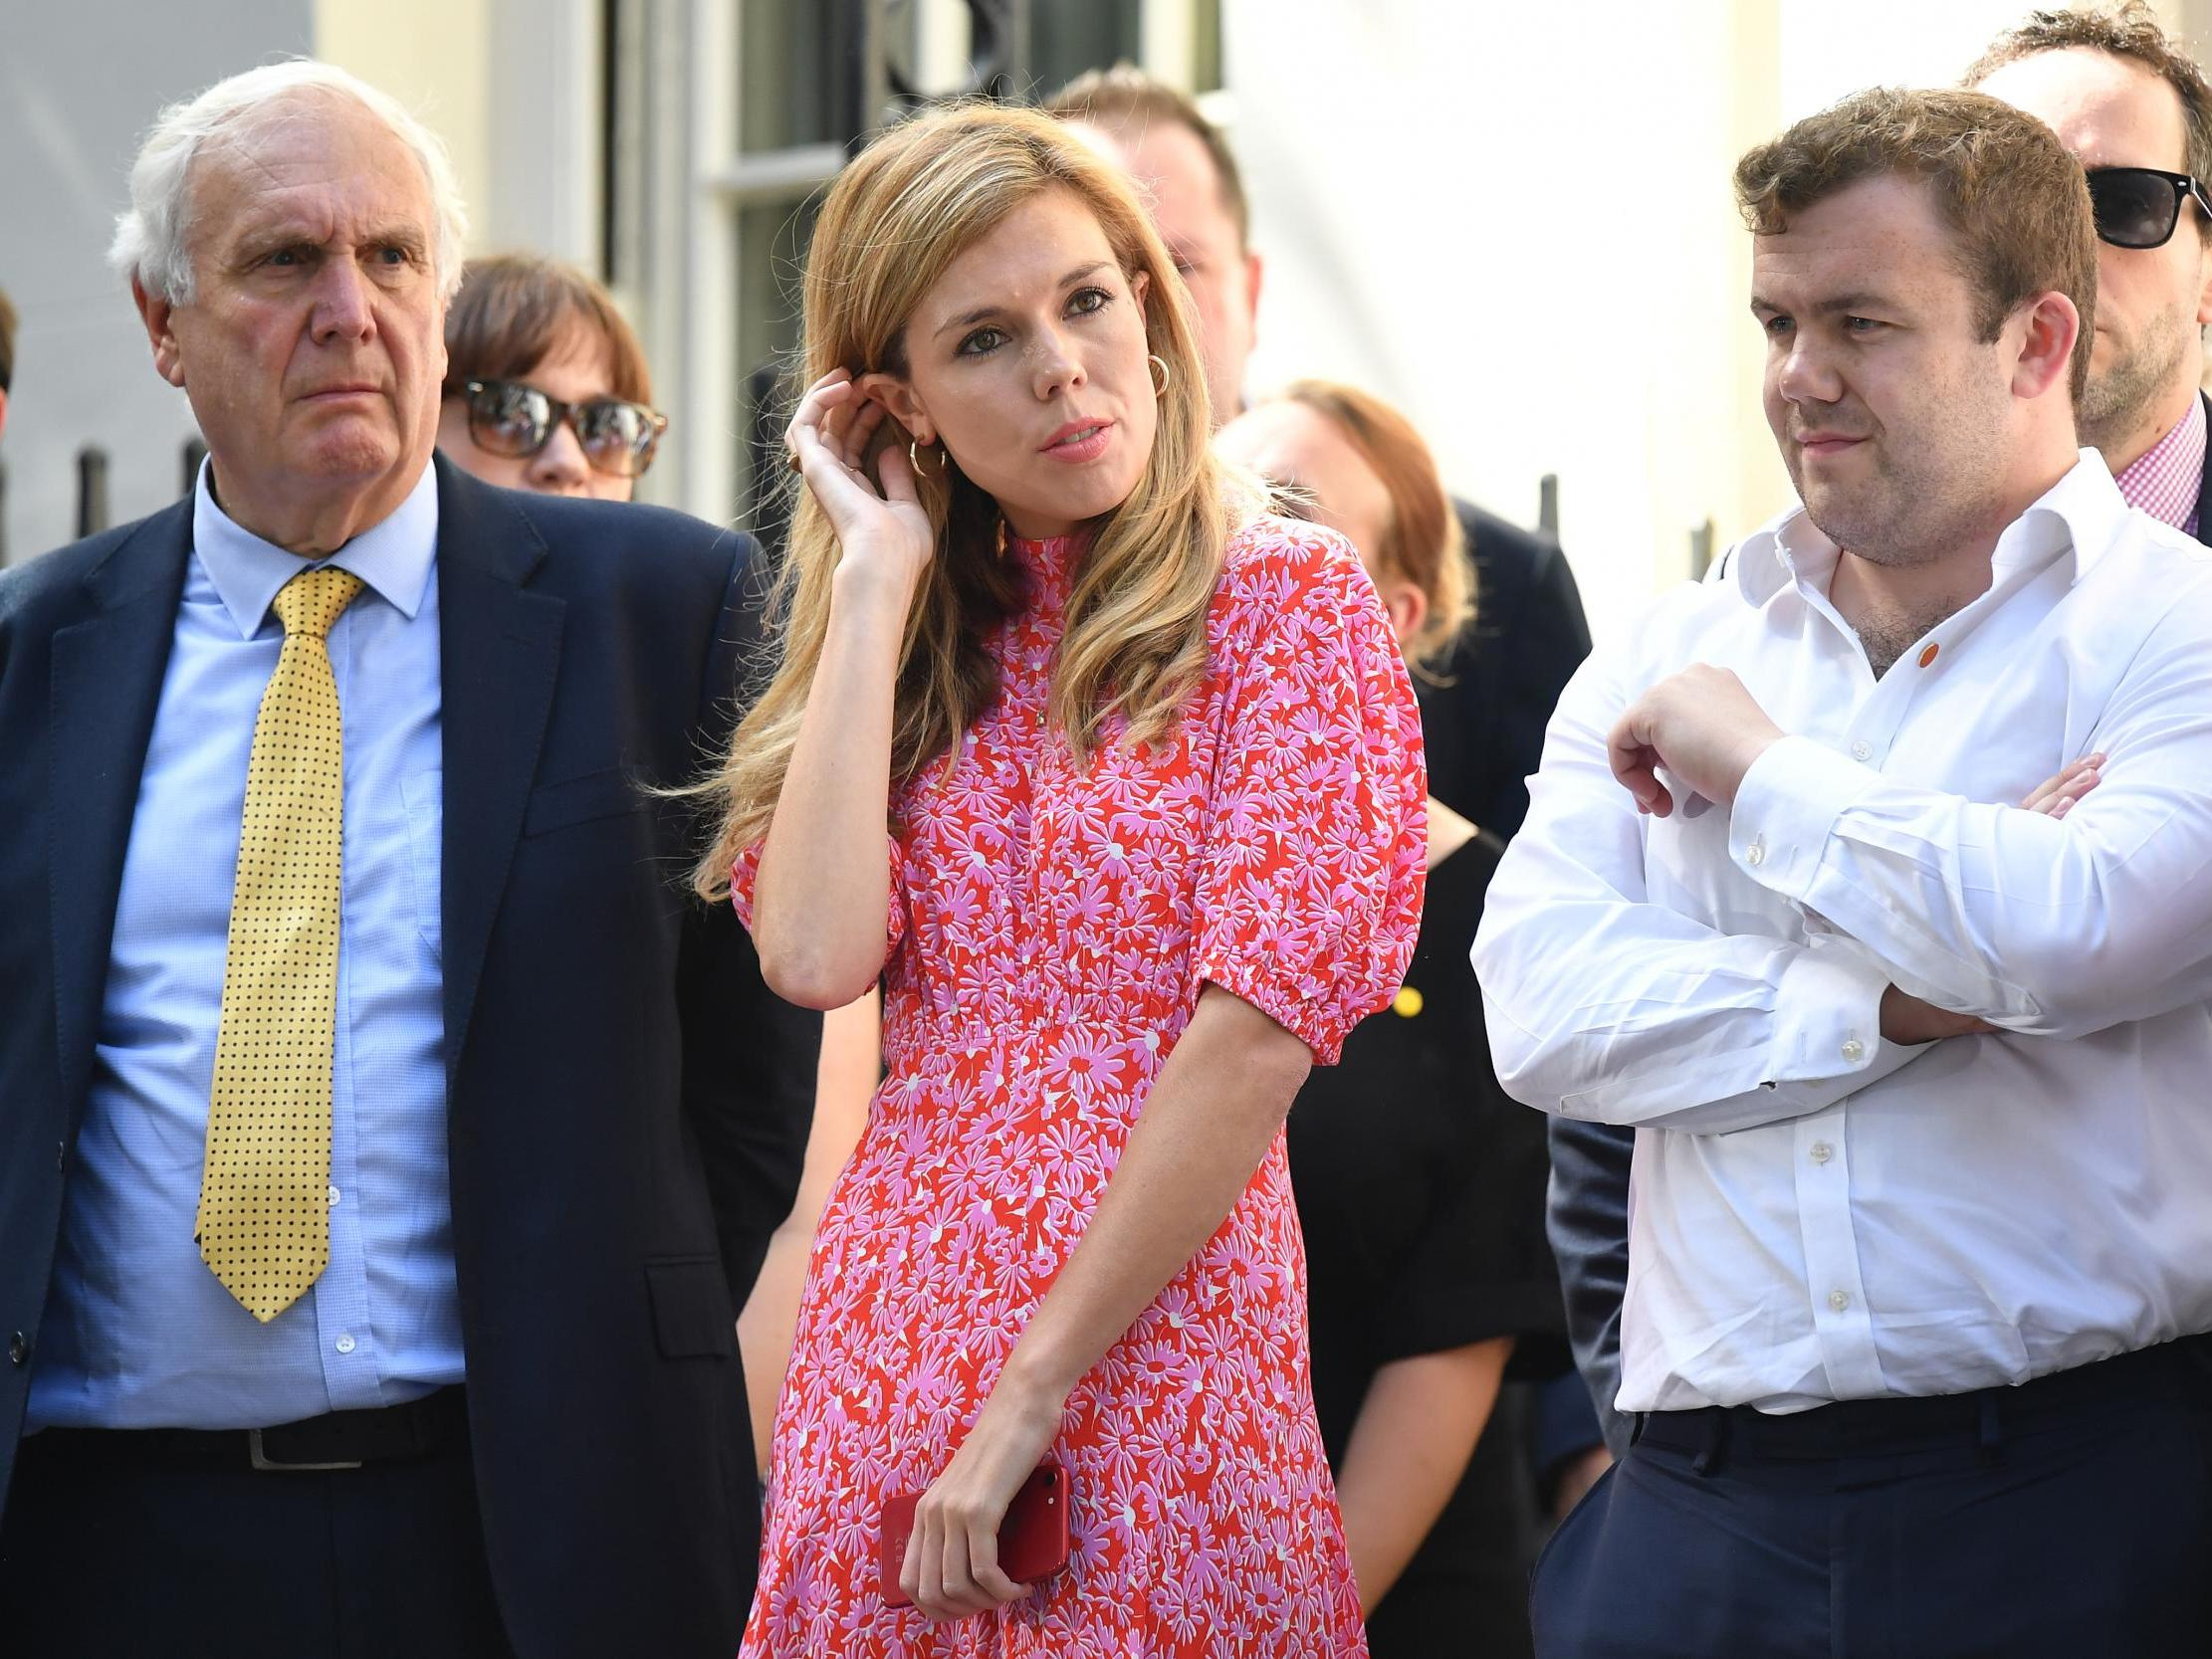 Boris Johnson's partner Carrie Symonds to give speech then appear on…